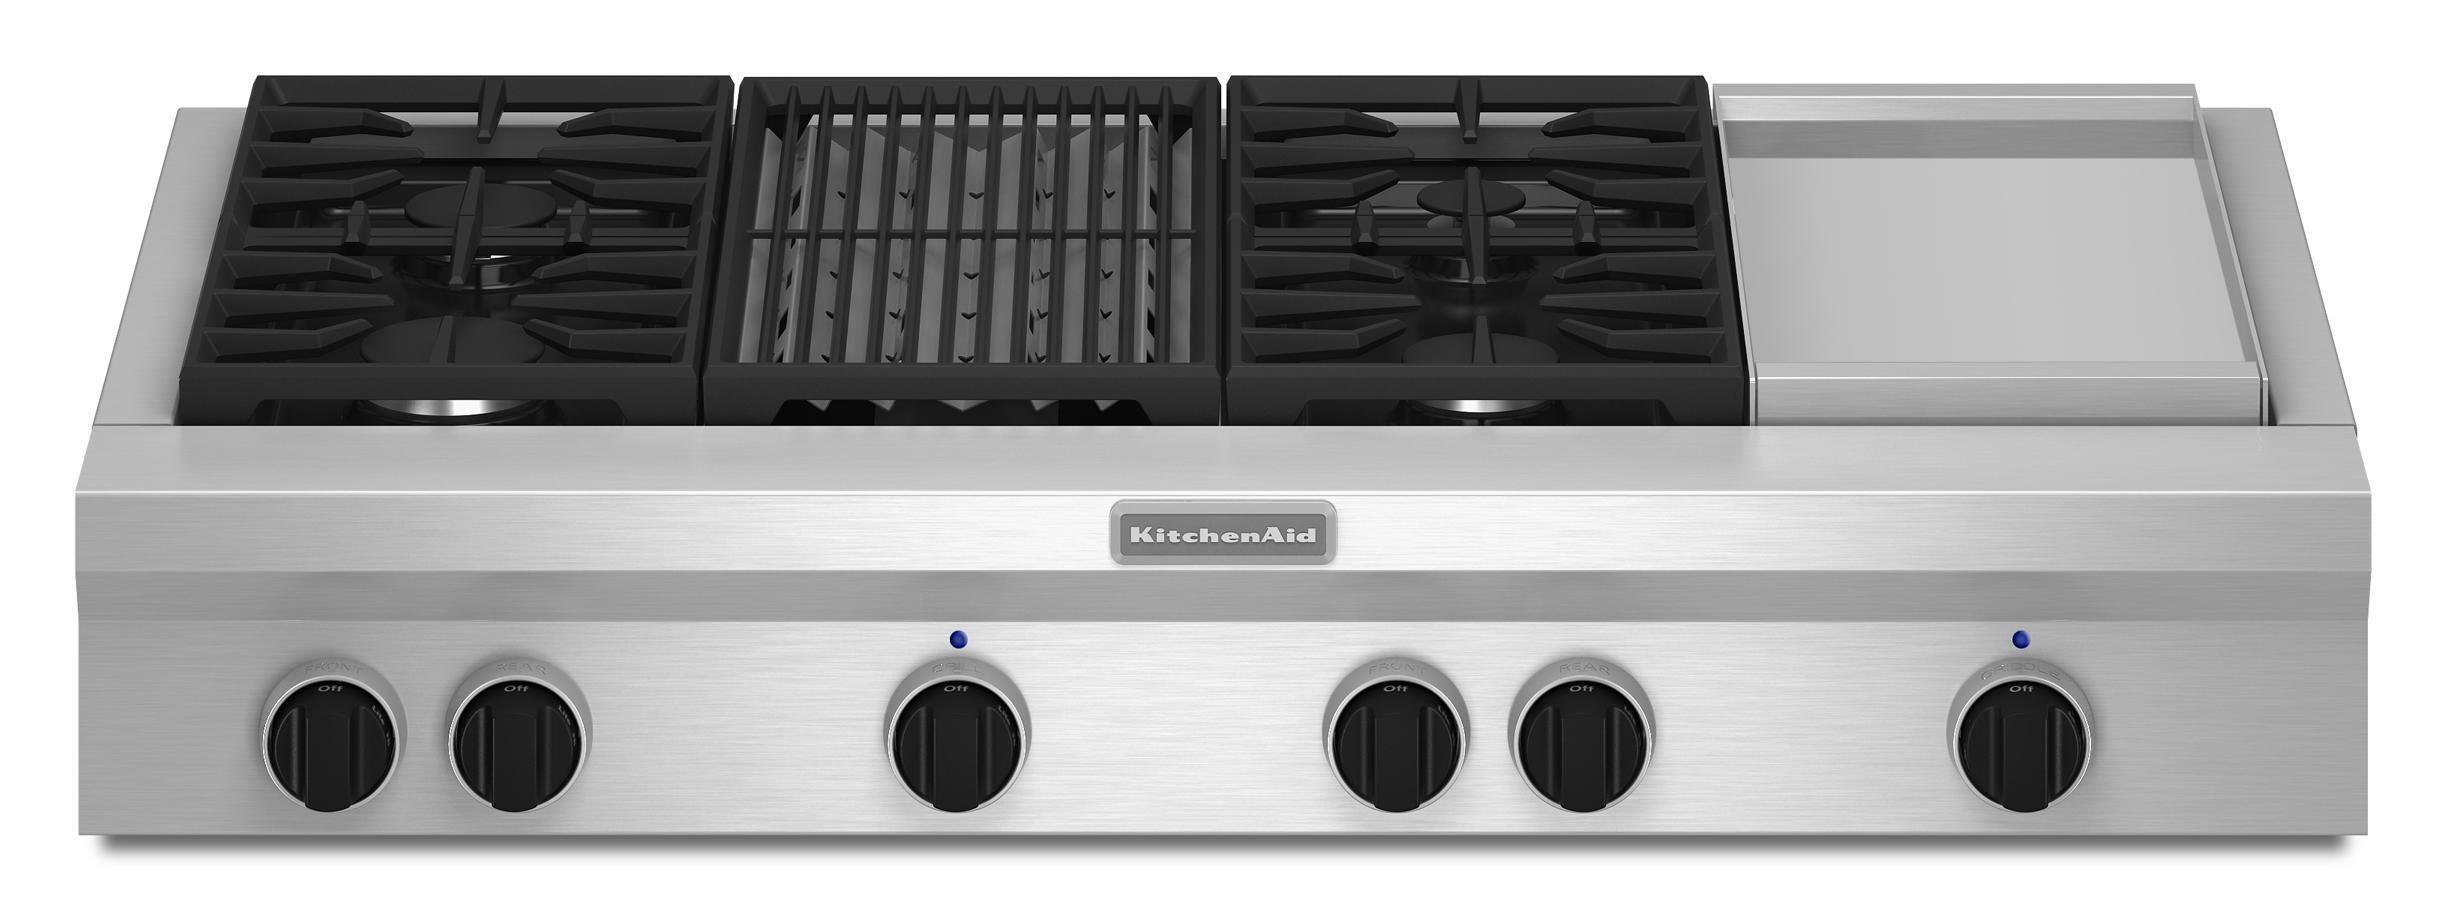 "KitchenAid Gas Cooktops 48"" Built-In Gas Cooktop - Item Number: KGCU484VSS"